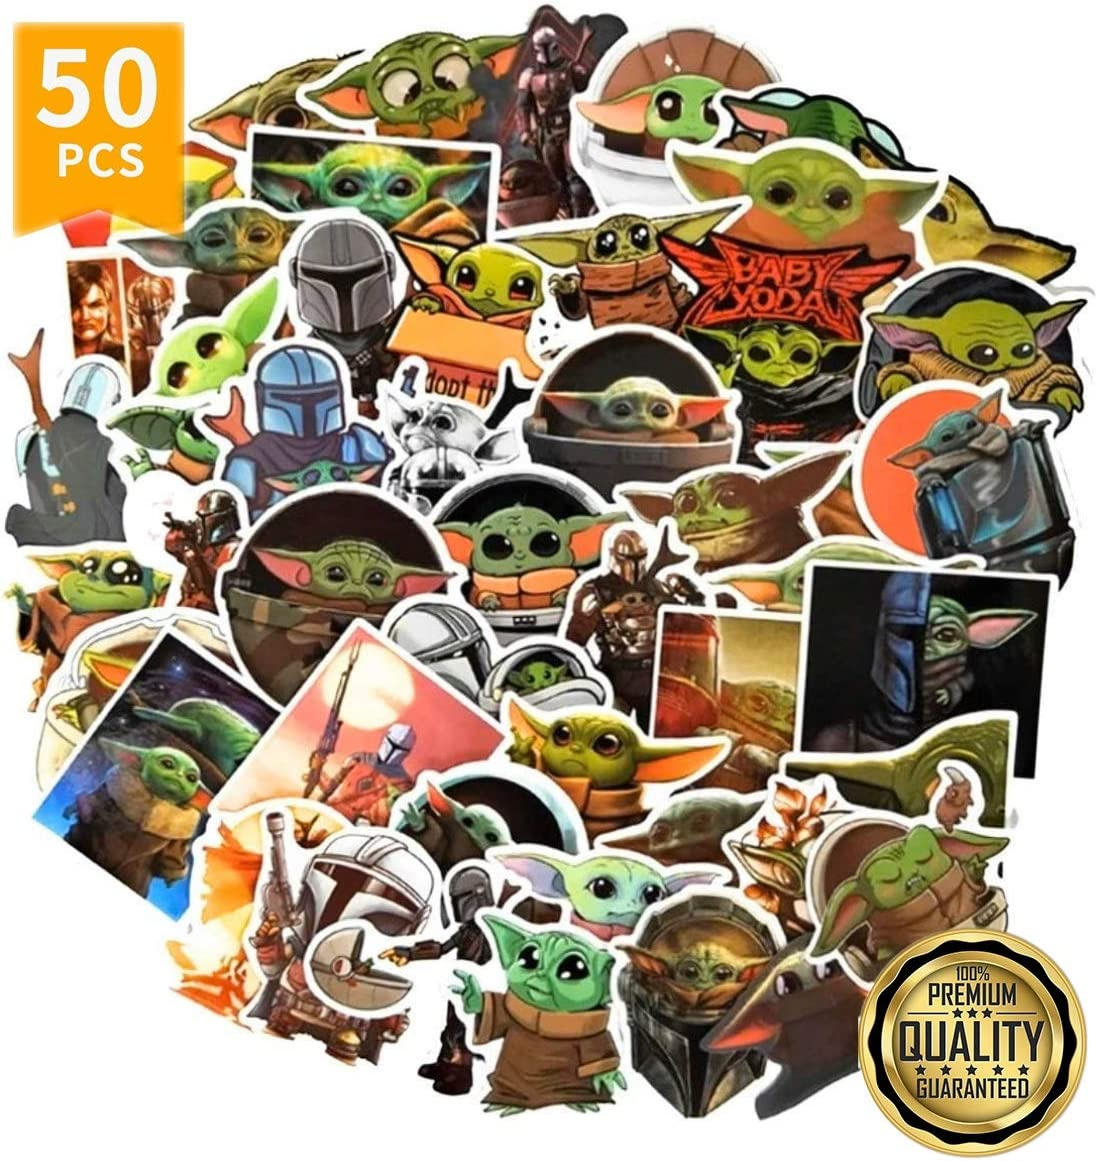 Baby Yoda Stickers [50 PCS], The Mandalorian Merchandise Sticker with Yoda Baby for Hydro Flask Laptop Mug Water Bottles Laptop Phone Car Bumper Skateboard, Waterproof Decals Extra Durable 100% Vinyl